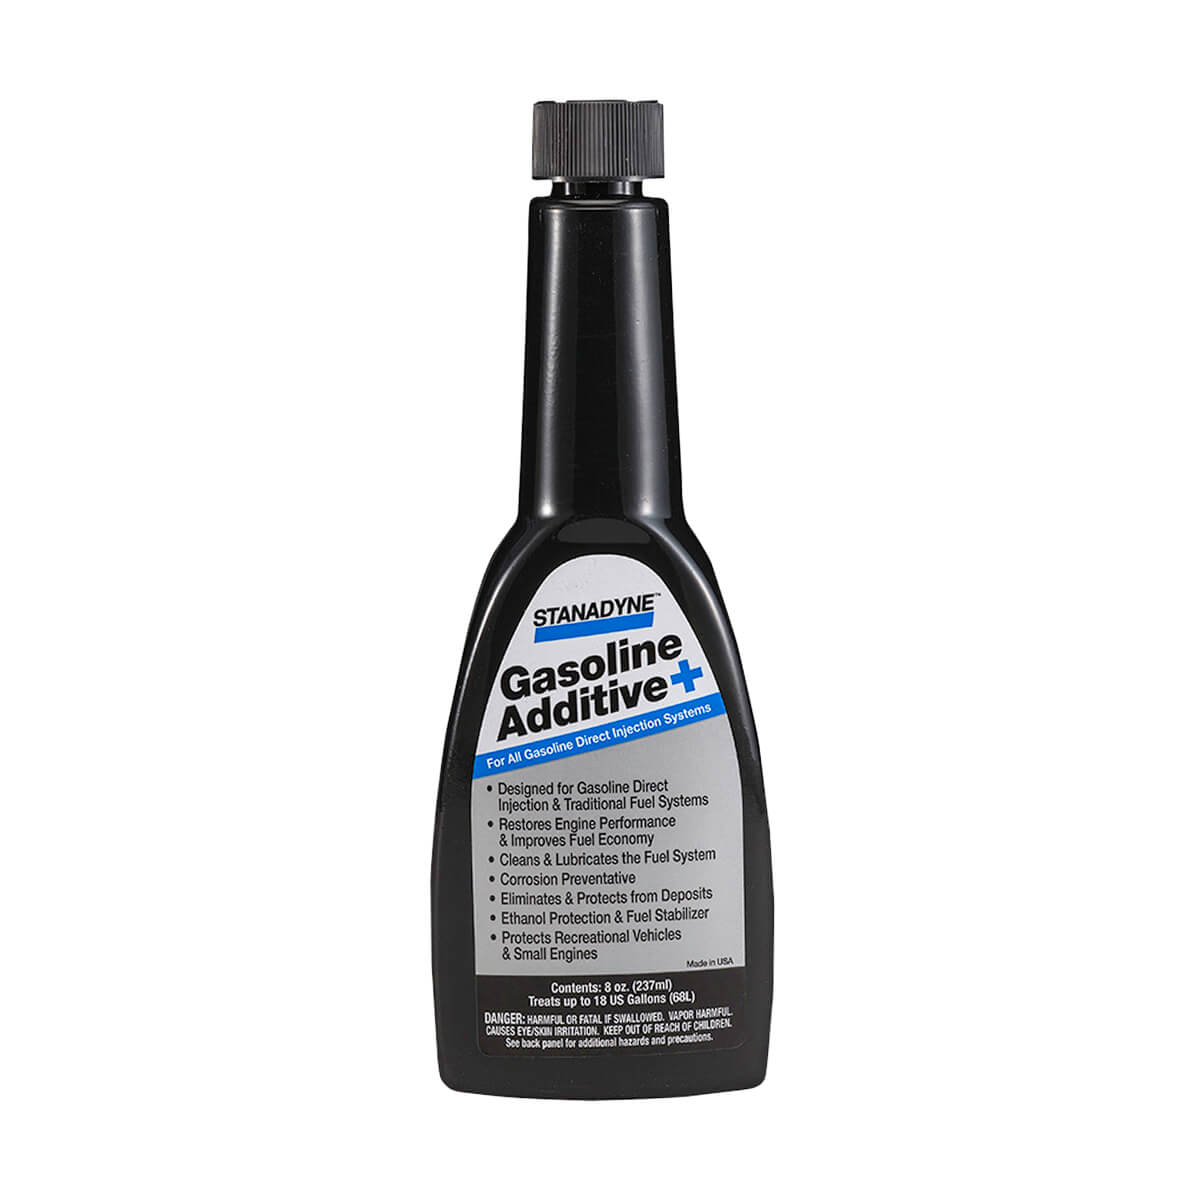 355 mL Stanadyne Gasoline Additive+